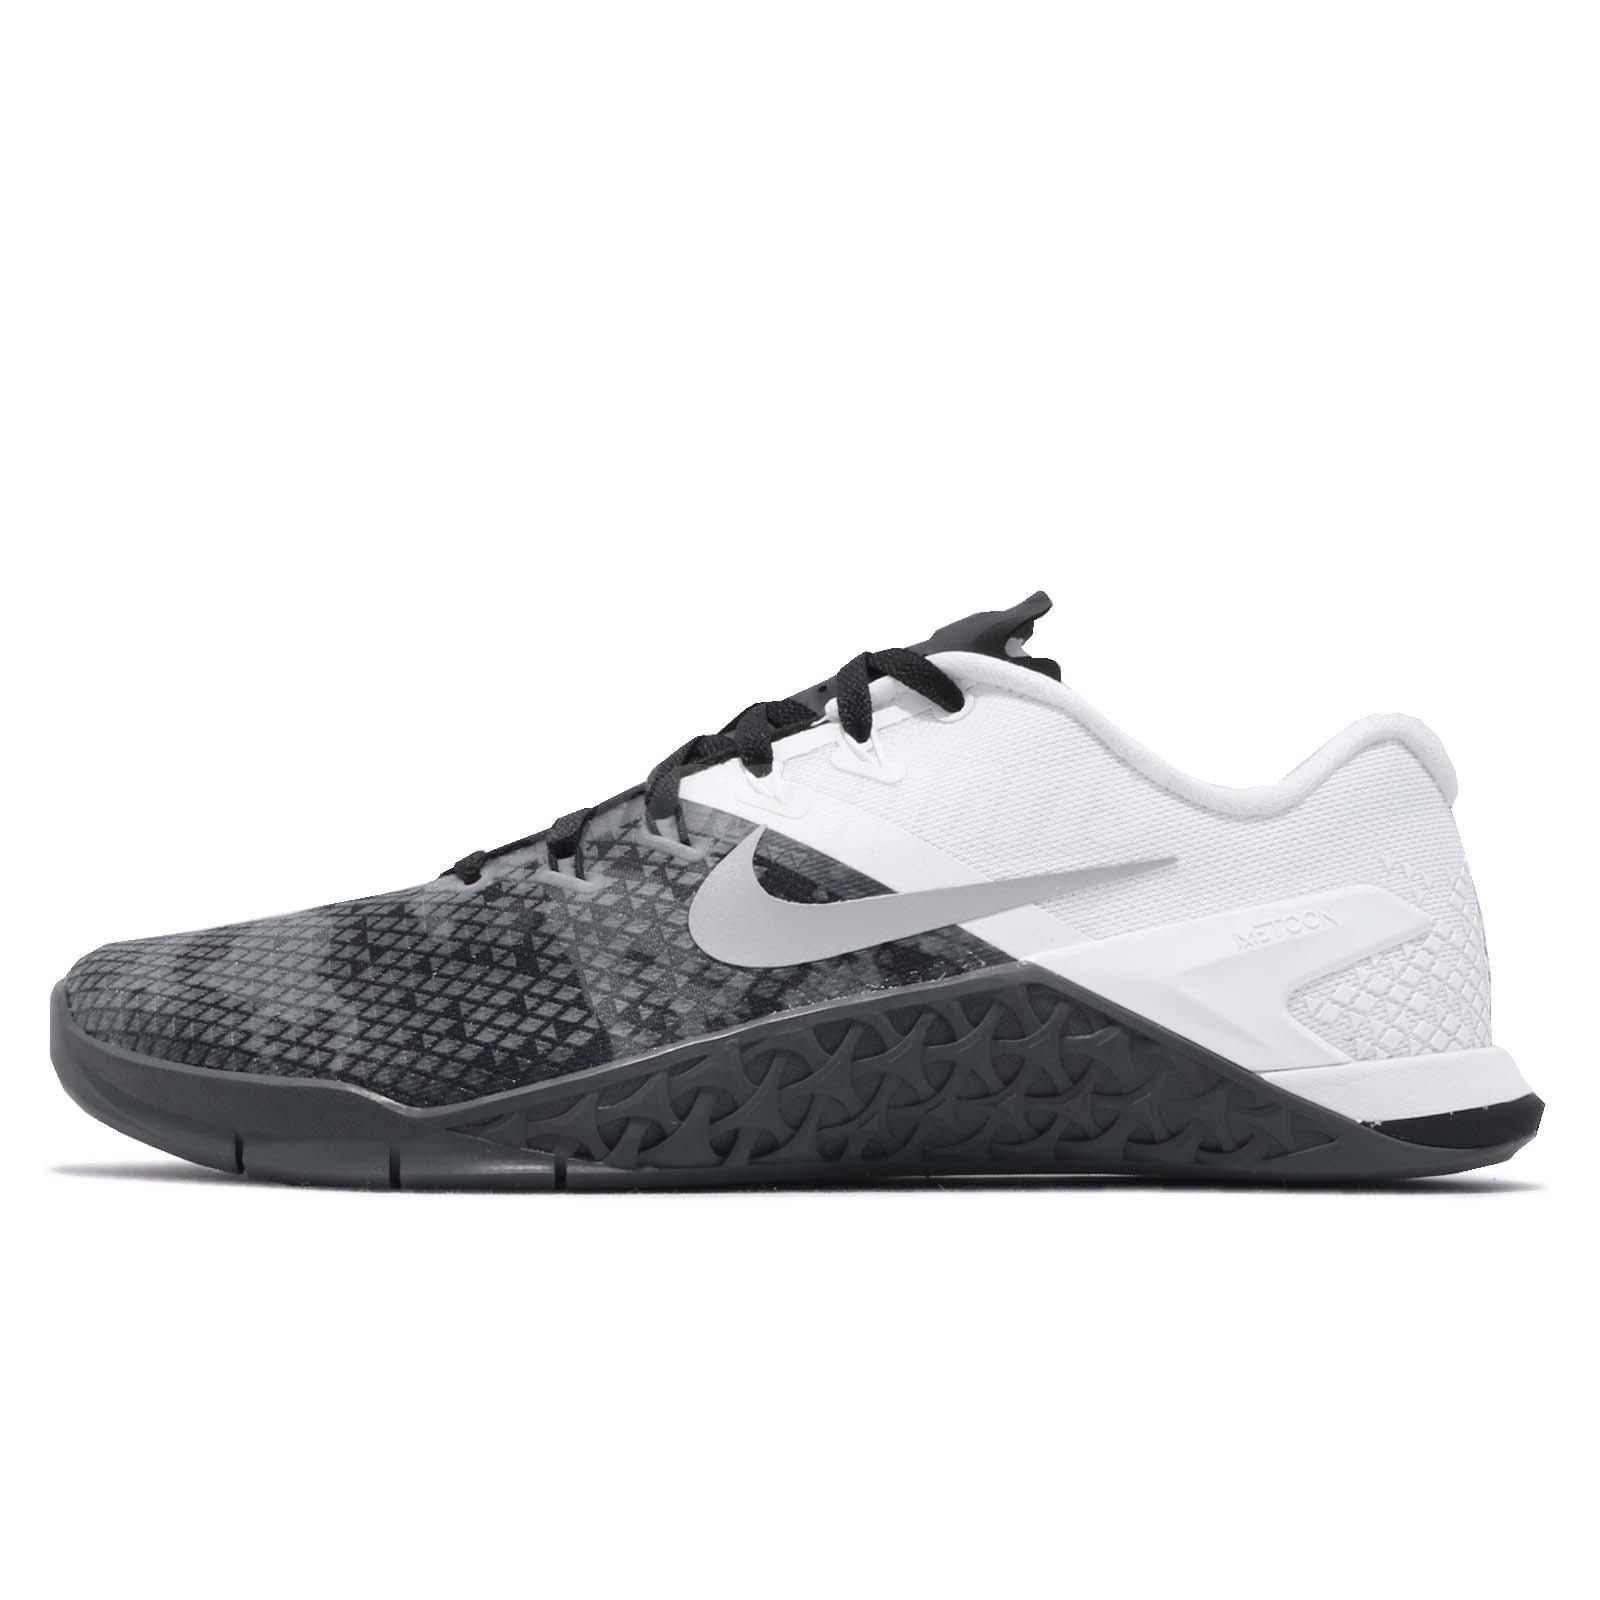 fc405de28cf5c Nike Metcon 4 XD Black Grey Men Cross Training Weight Lifting Shoes BV1636 -012